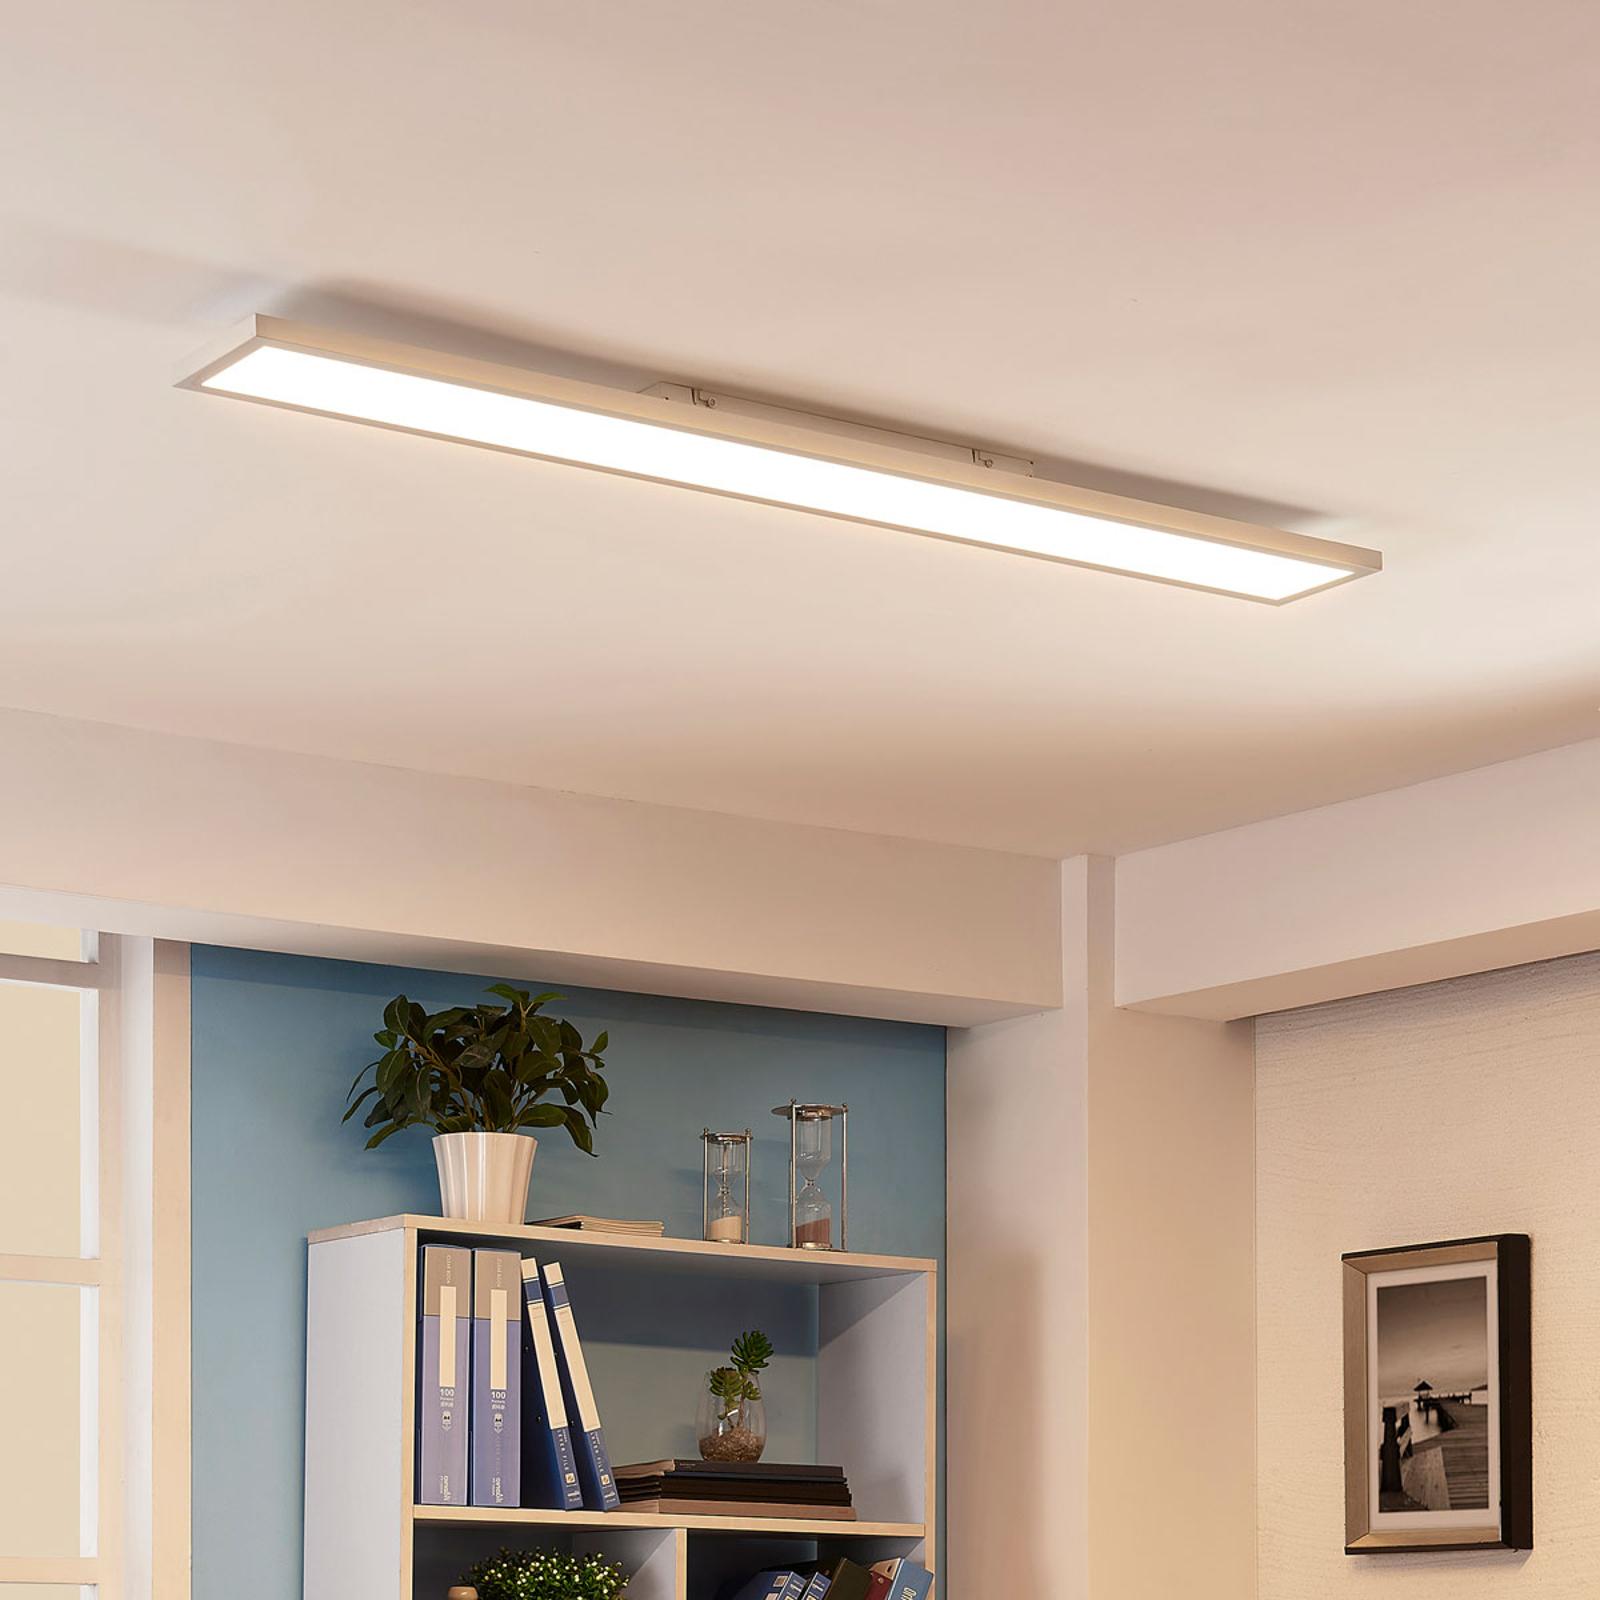 Langwerpige led plafondlamp Enora, 40W